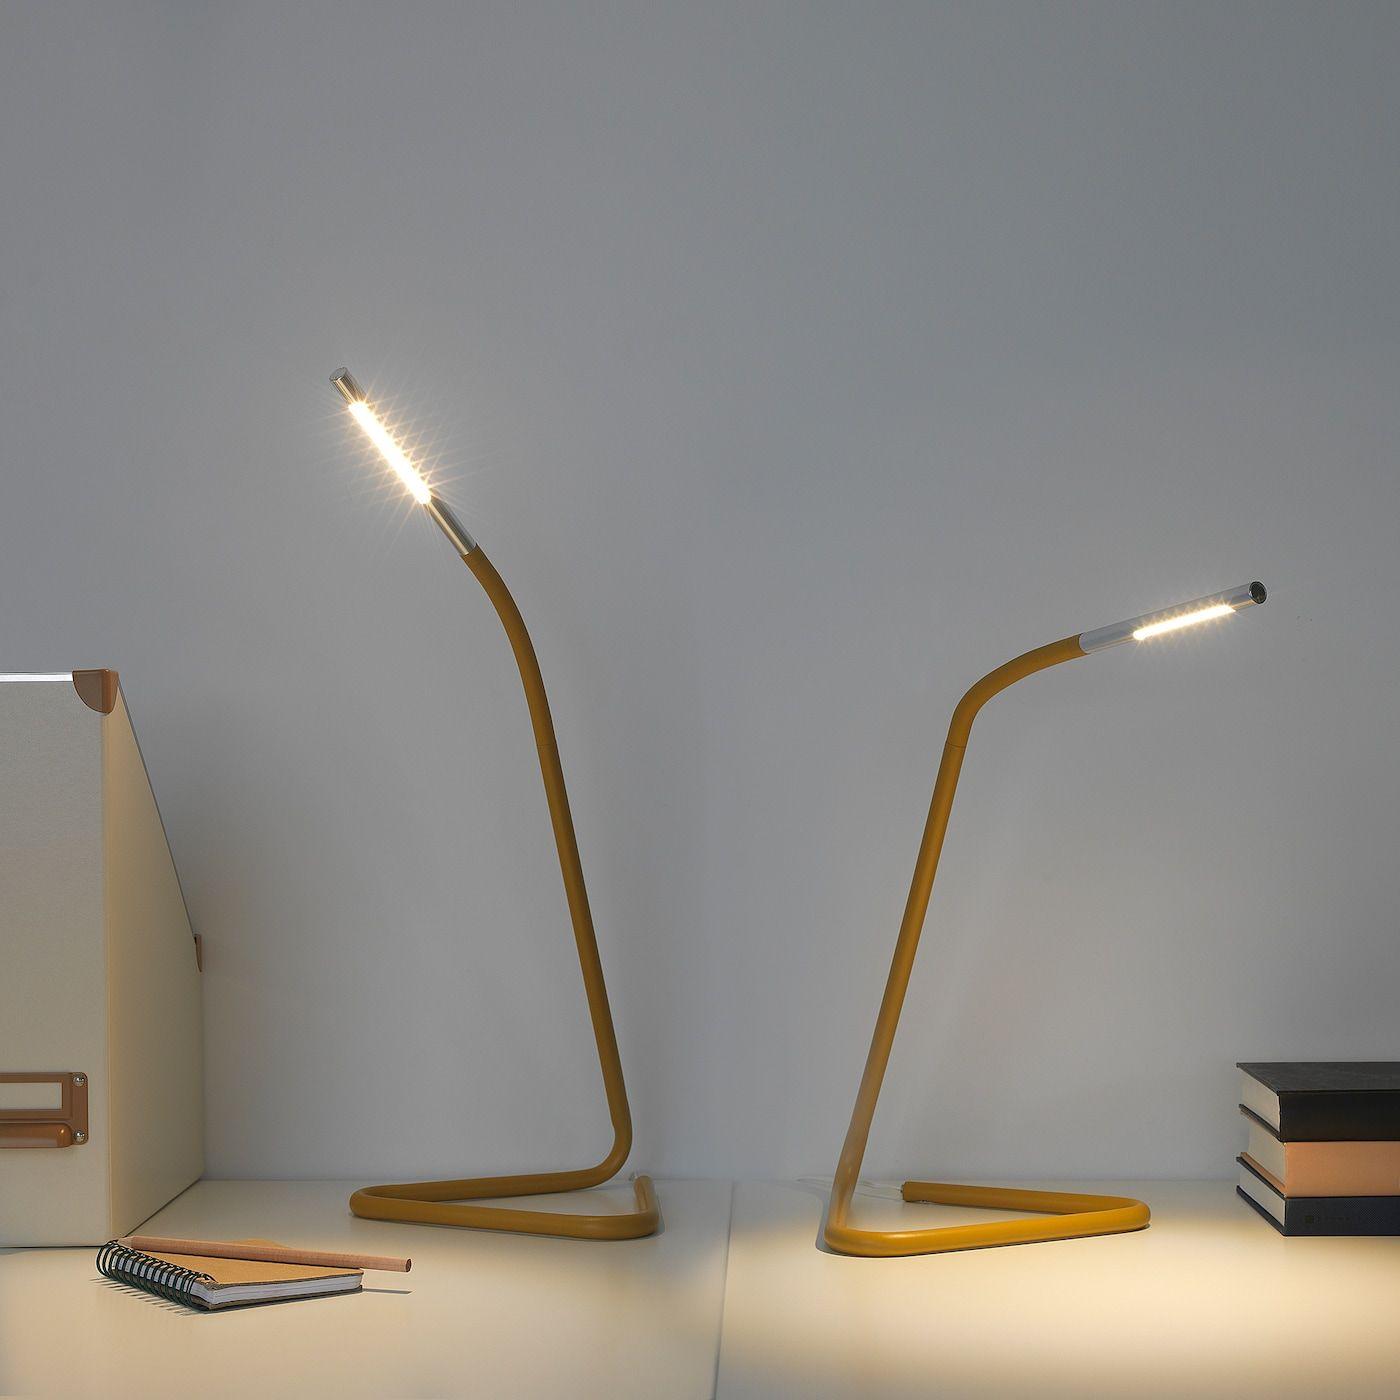 Harte Arbeitsleuchte Led Gelb Silberfarben Ikea Osterreich Lamp Work Lamp Can Lights